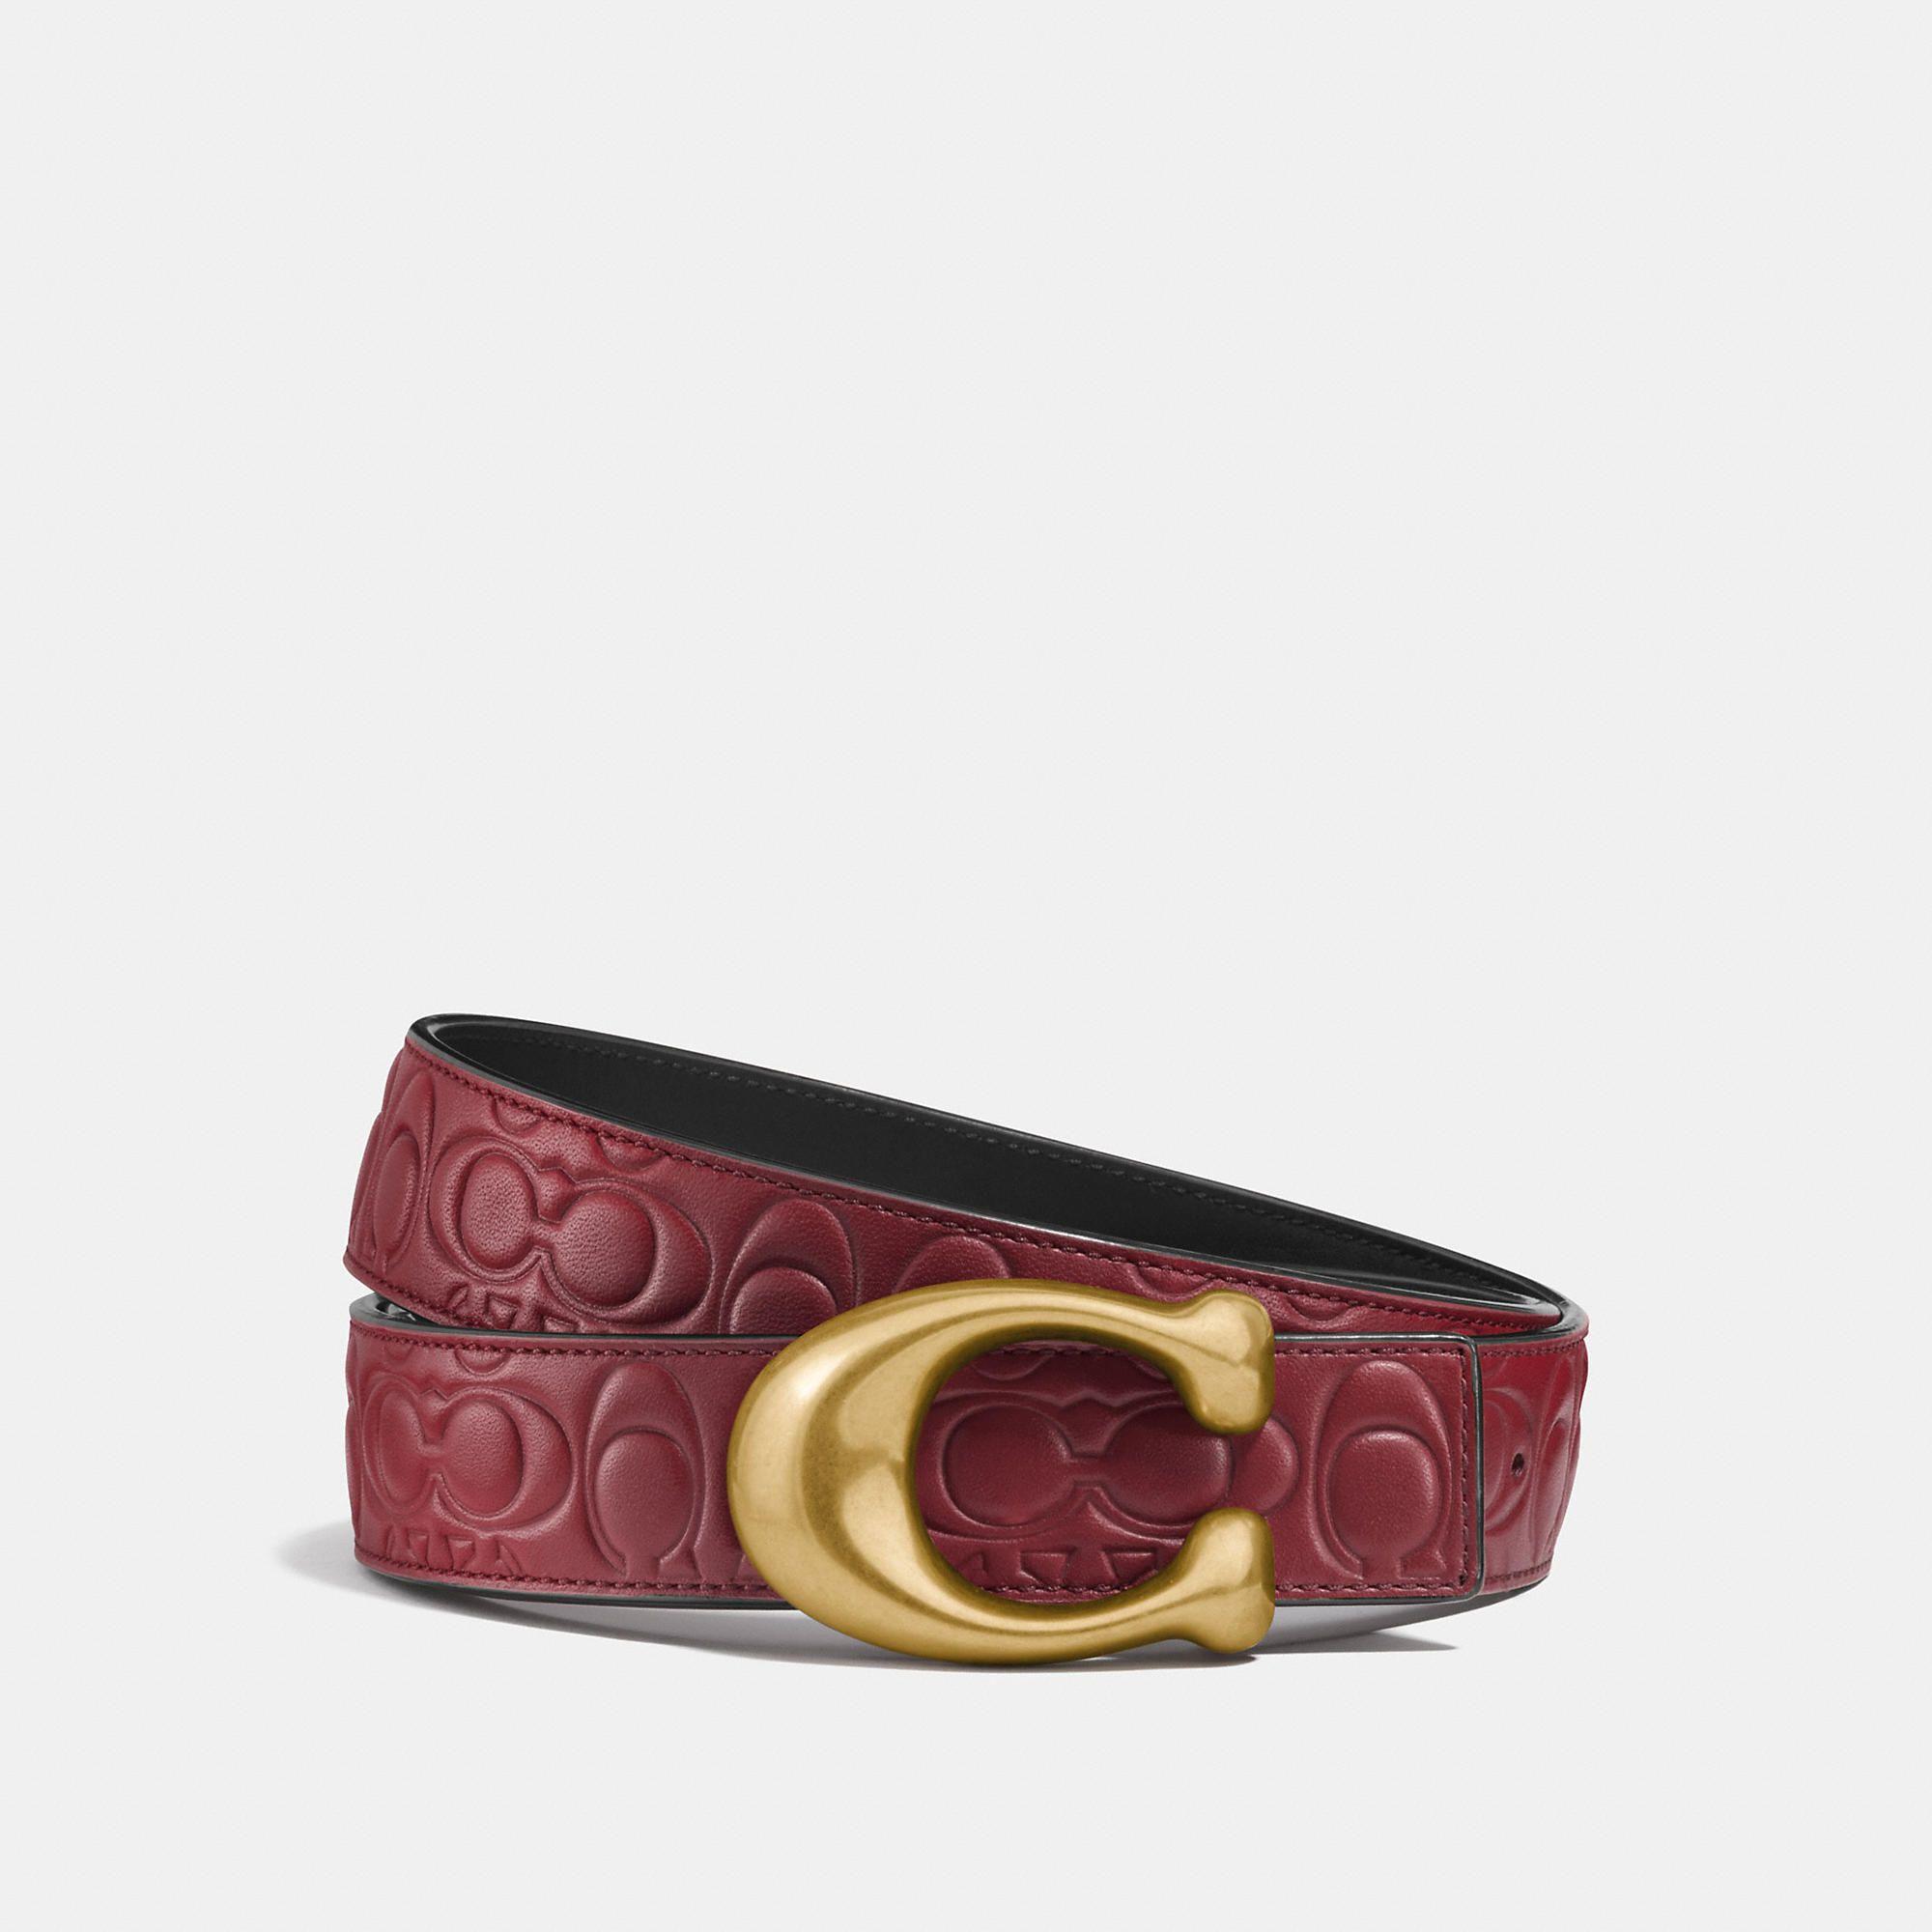 Signature buckle reversible belt, 32mm Reversible belt